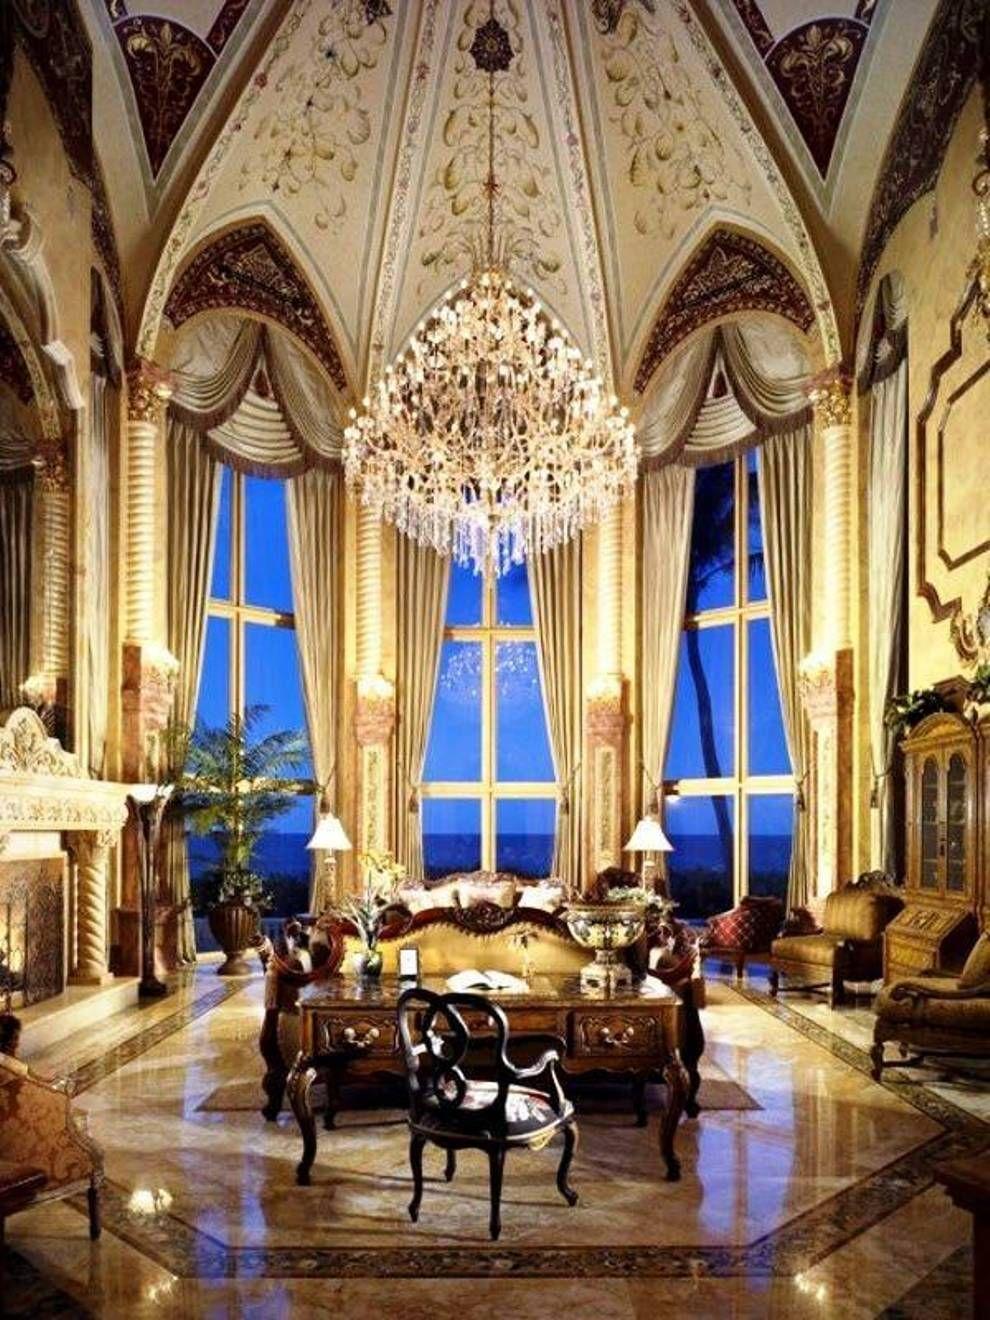 Luxurious Living Room: Home Design And Decor , Extravagant Luxury Interior Design